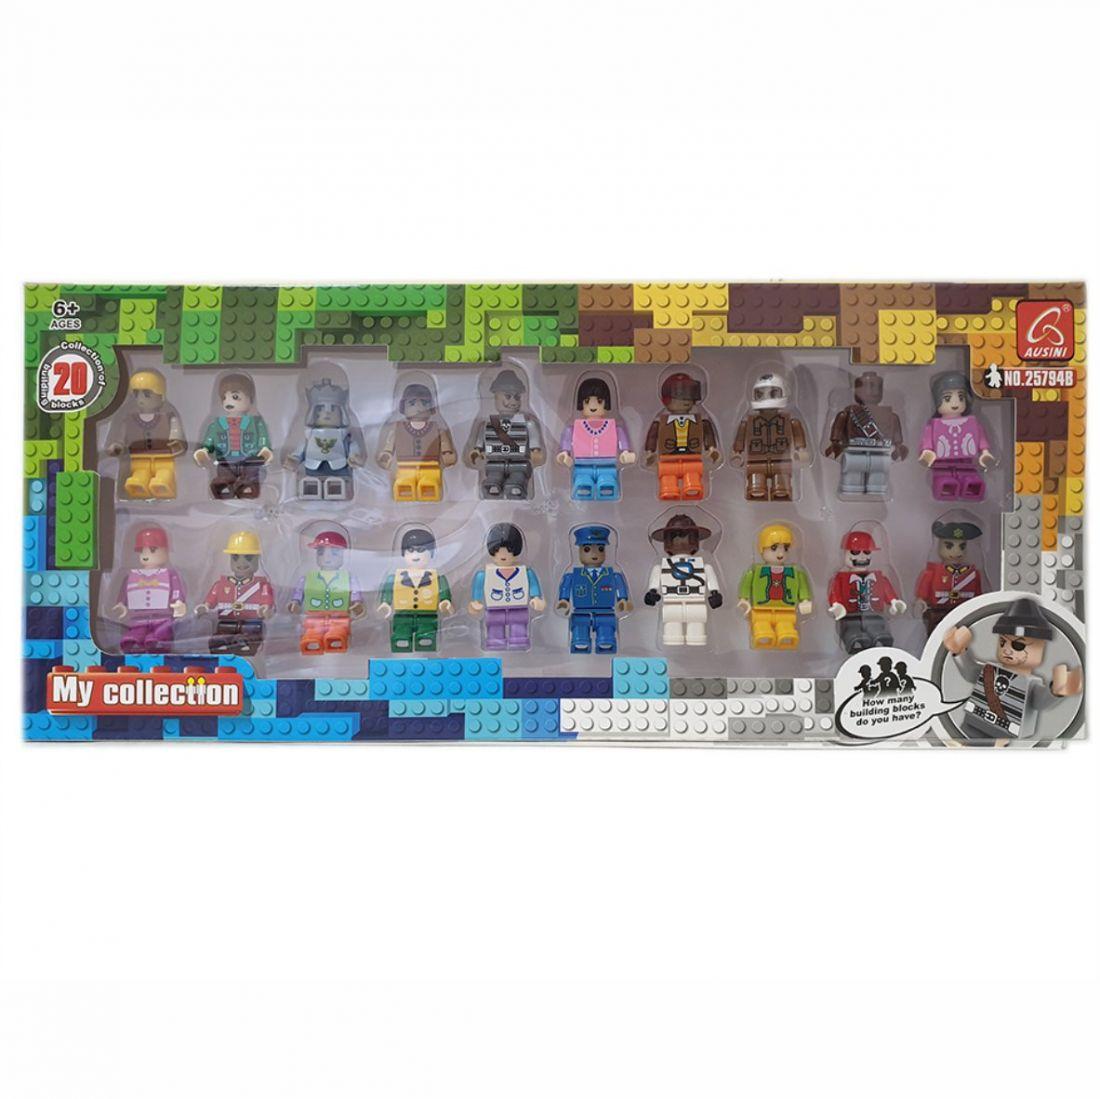 20 фигурок персонажей для конструктора Лего